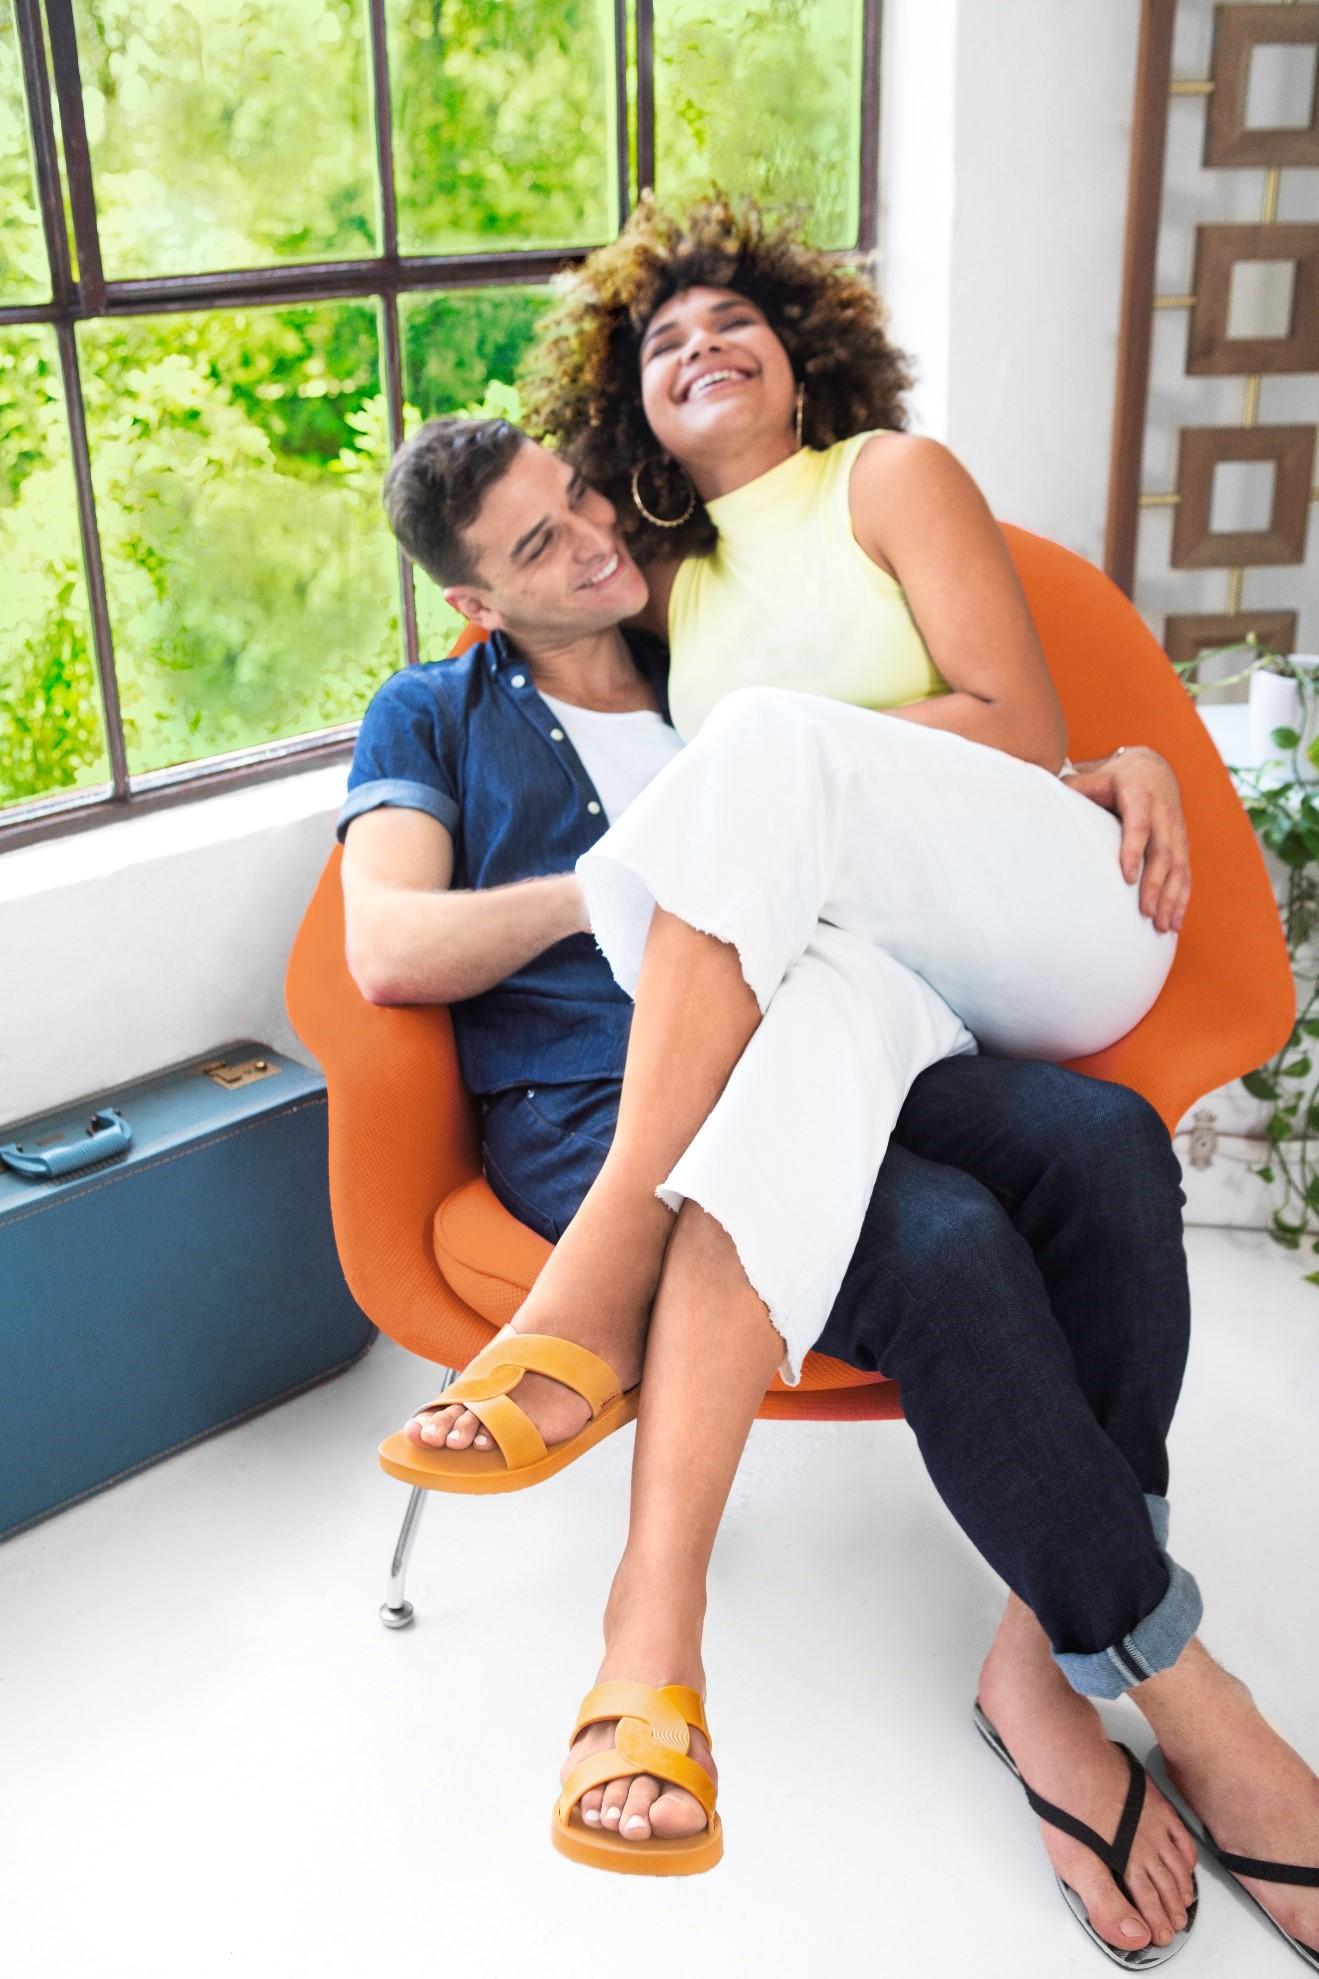 Ipanema Experience: Τα flip flops που μας οδηγούν σε αξέχαστες καλοκαιρινές εμπειρίες!